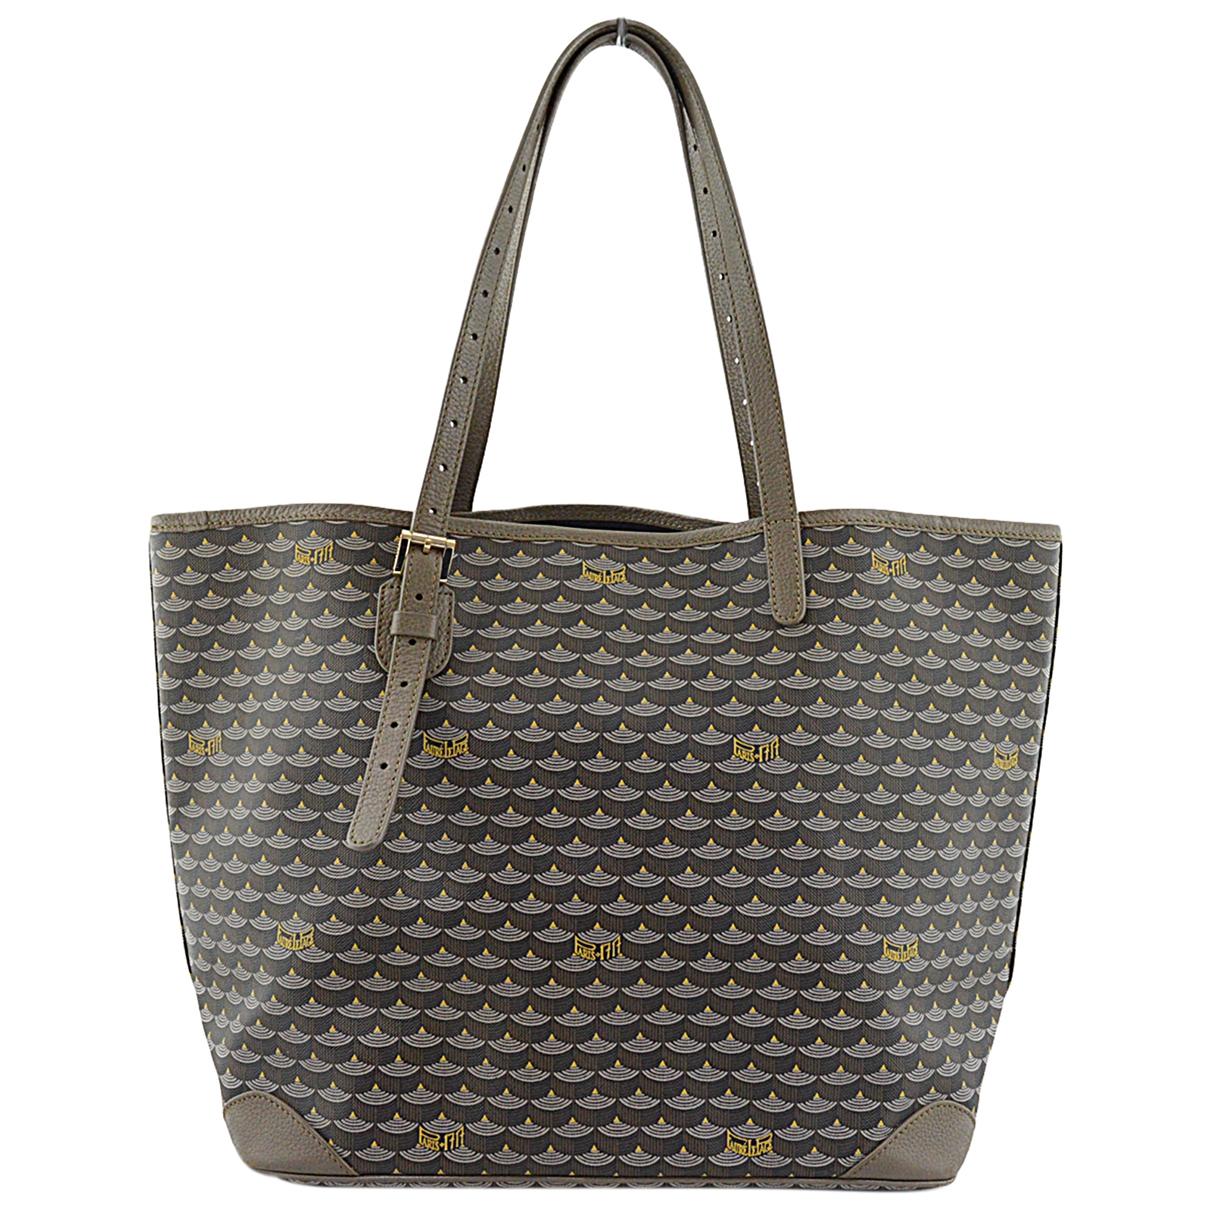 Faure Le Page Daily Battle Handtasche in  Grau Leinen